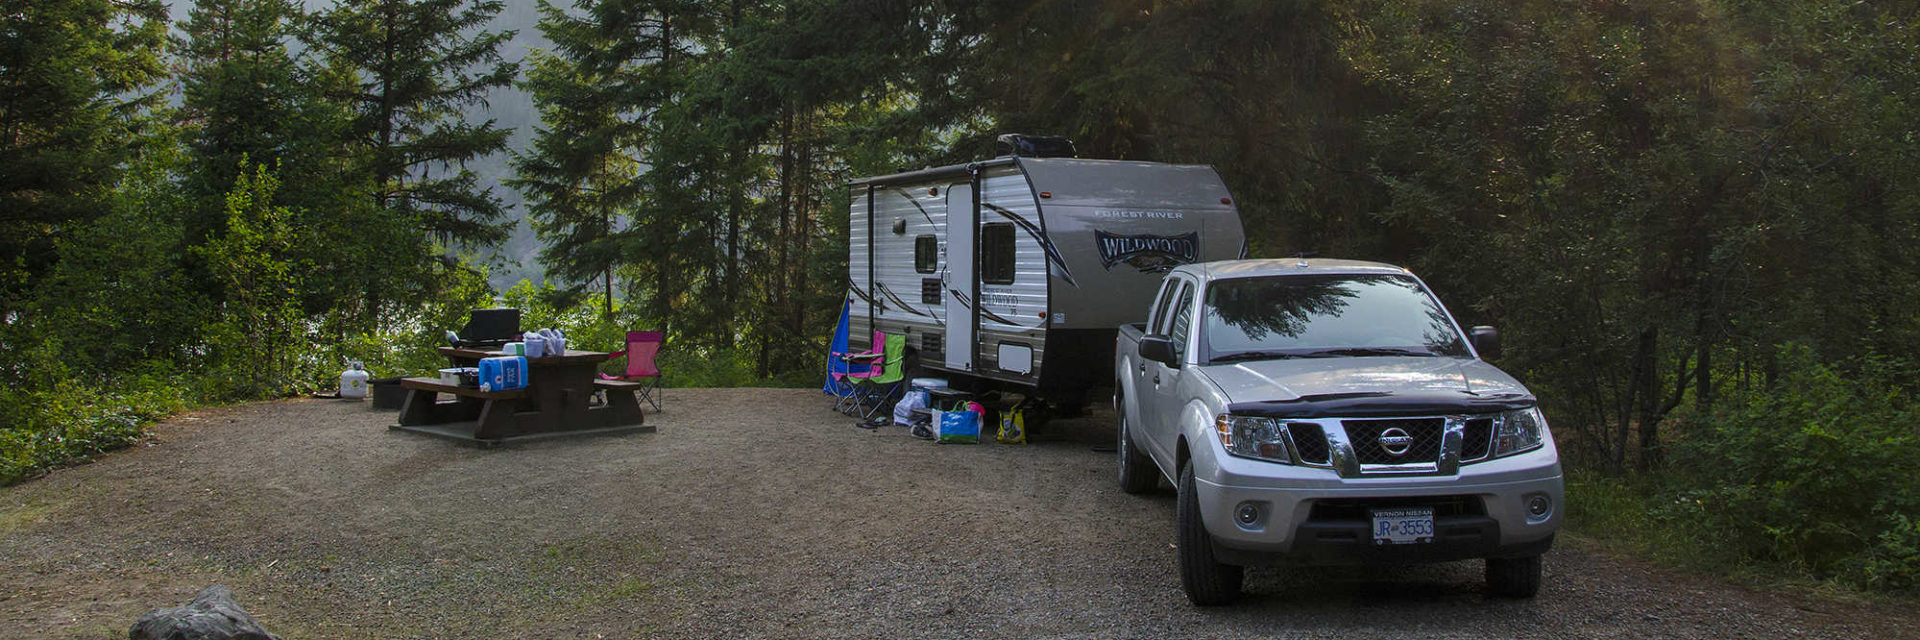 Camping & RVing in the Similkameen